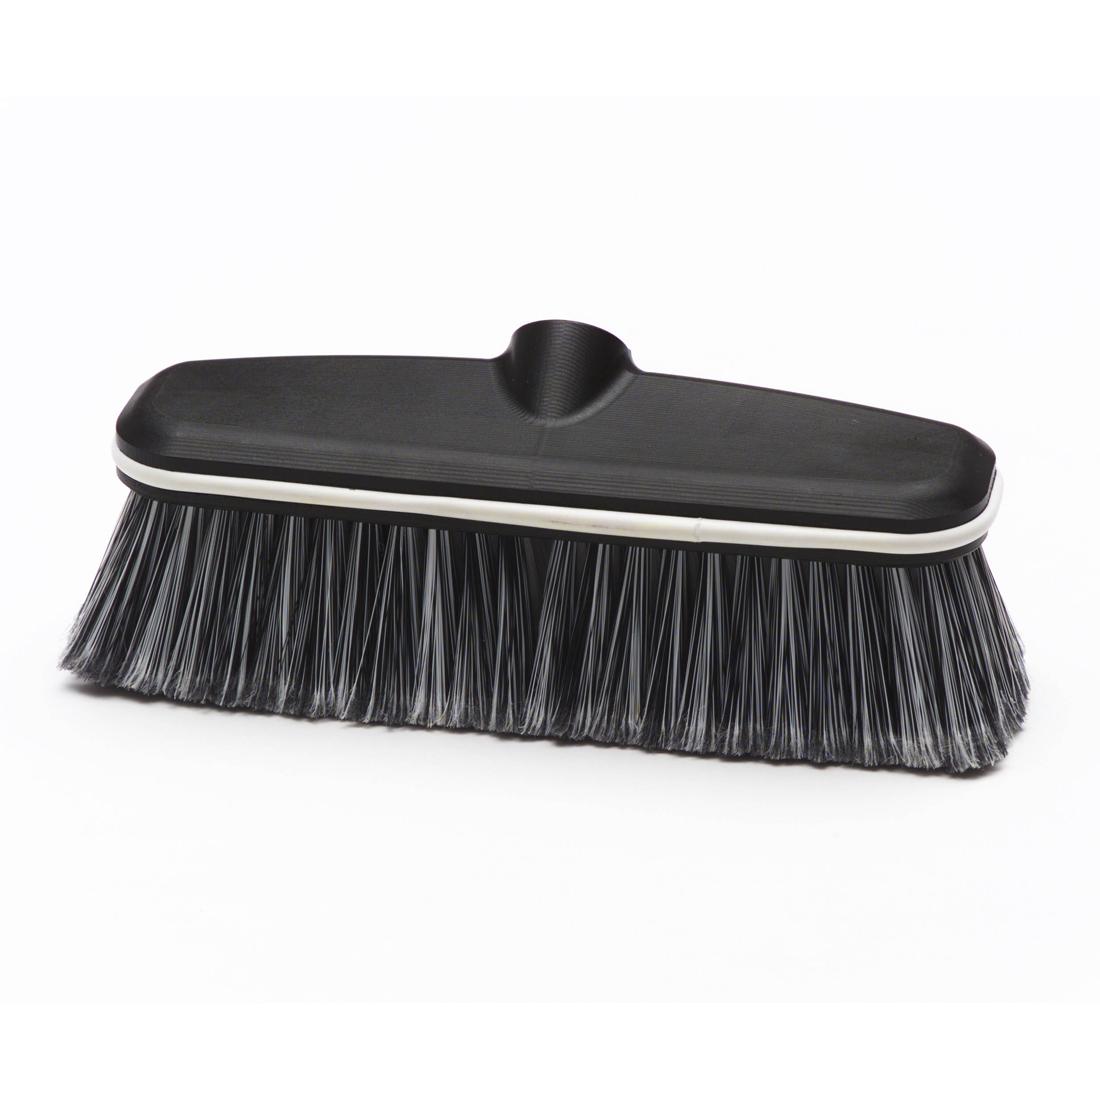 Supersoft Decon Brush